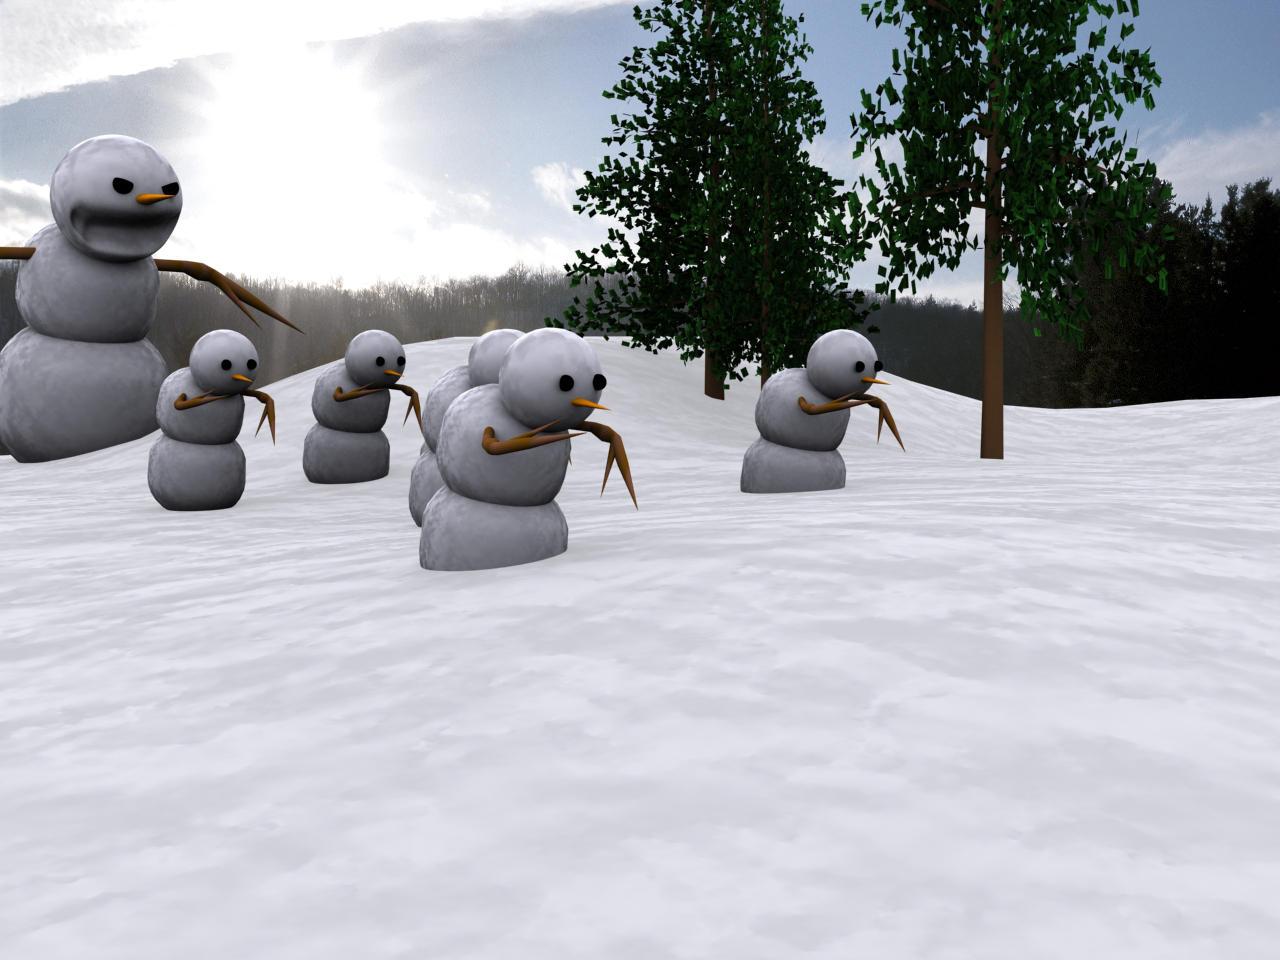 Calvin's Snowman by HalogeN09